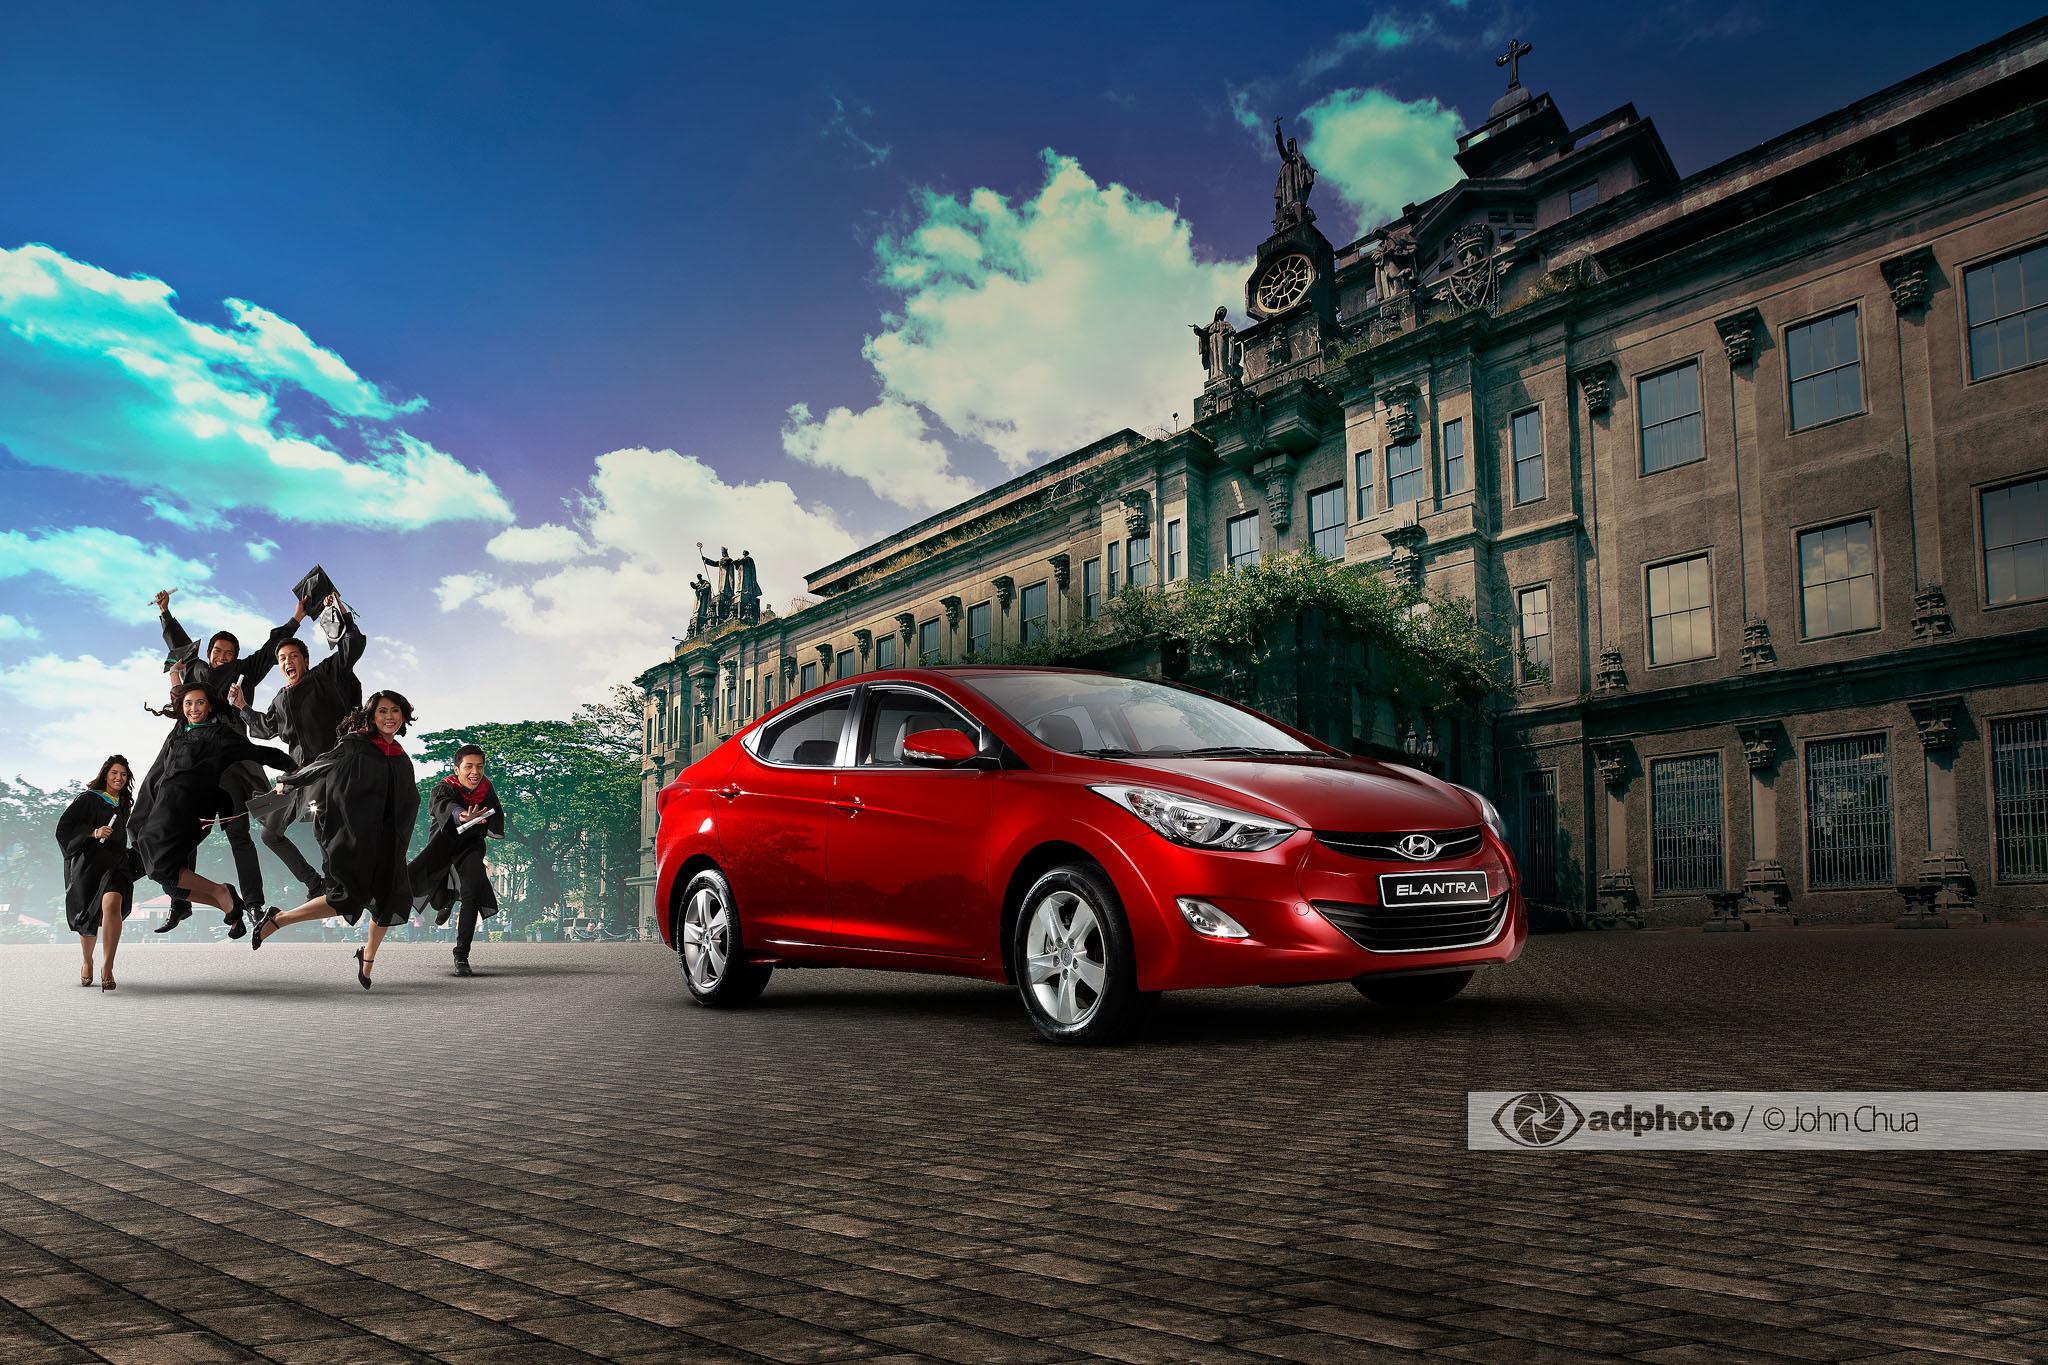 Automotive_John Chua_5.jpg